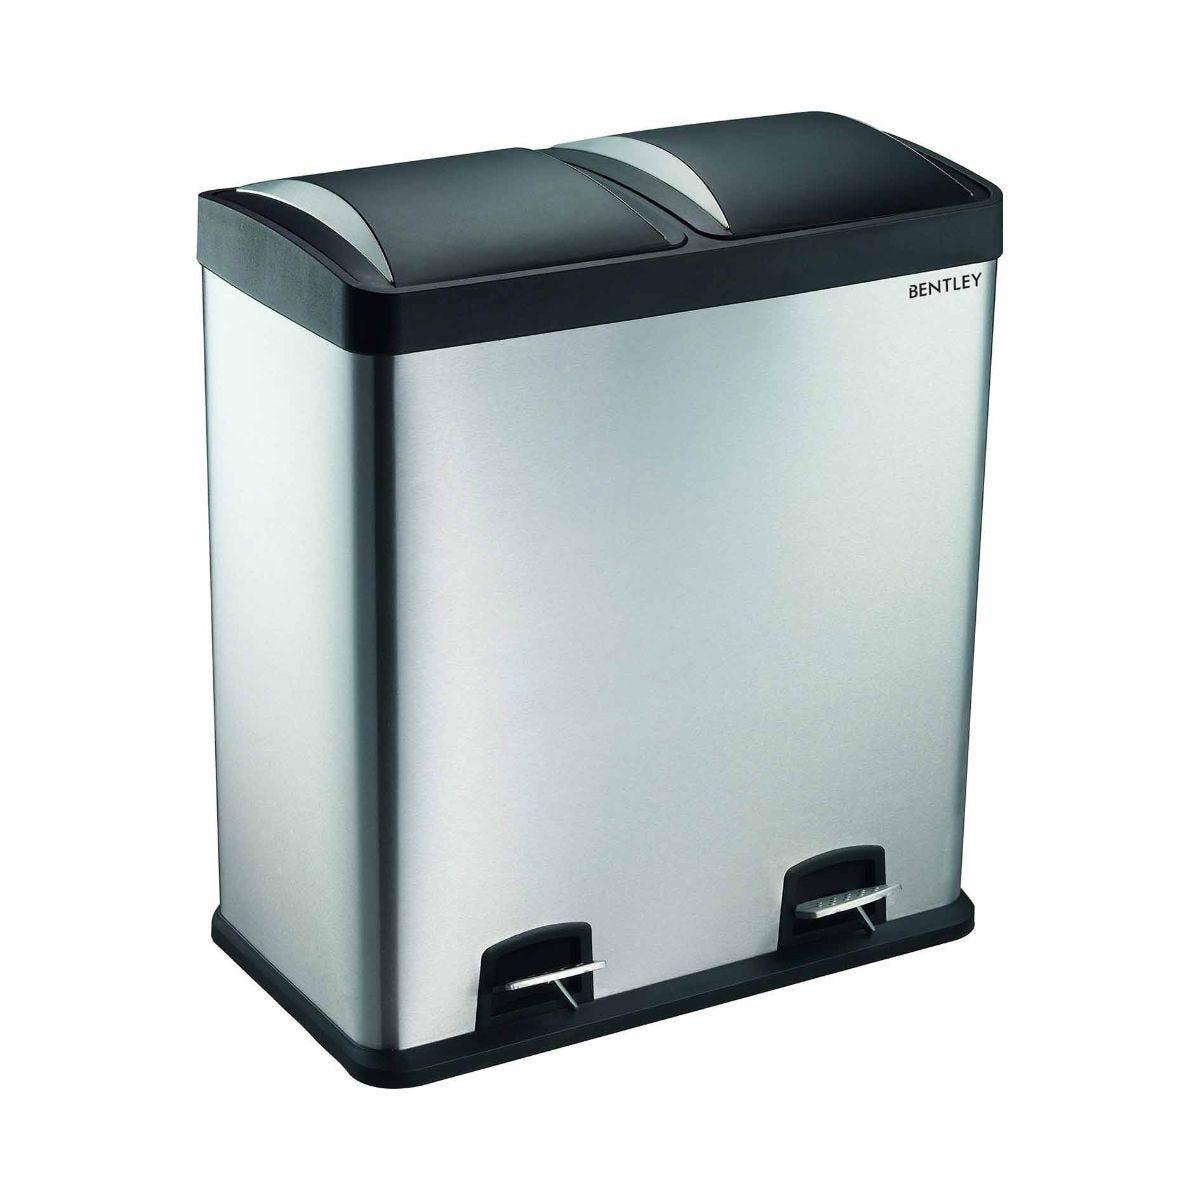 Rubbish Bin Waste Bins & Bags Cleaning Office Supplies - Ryman